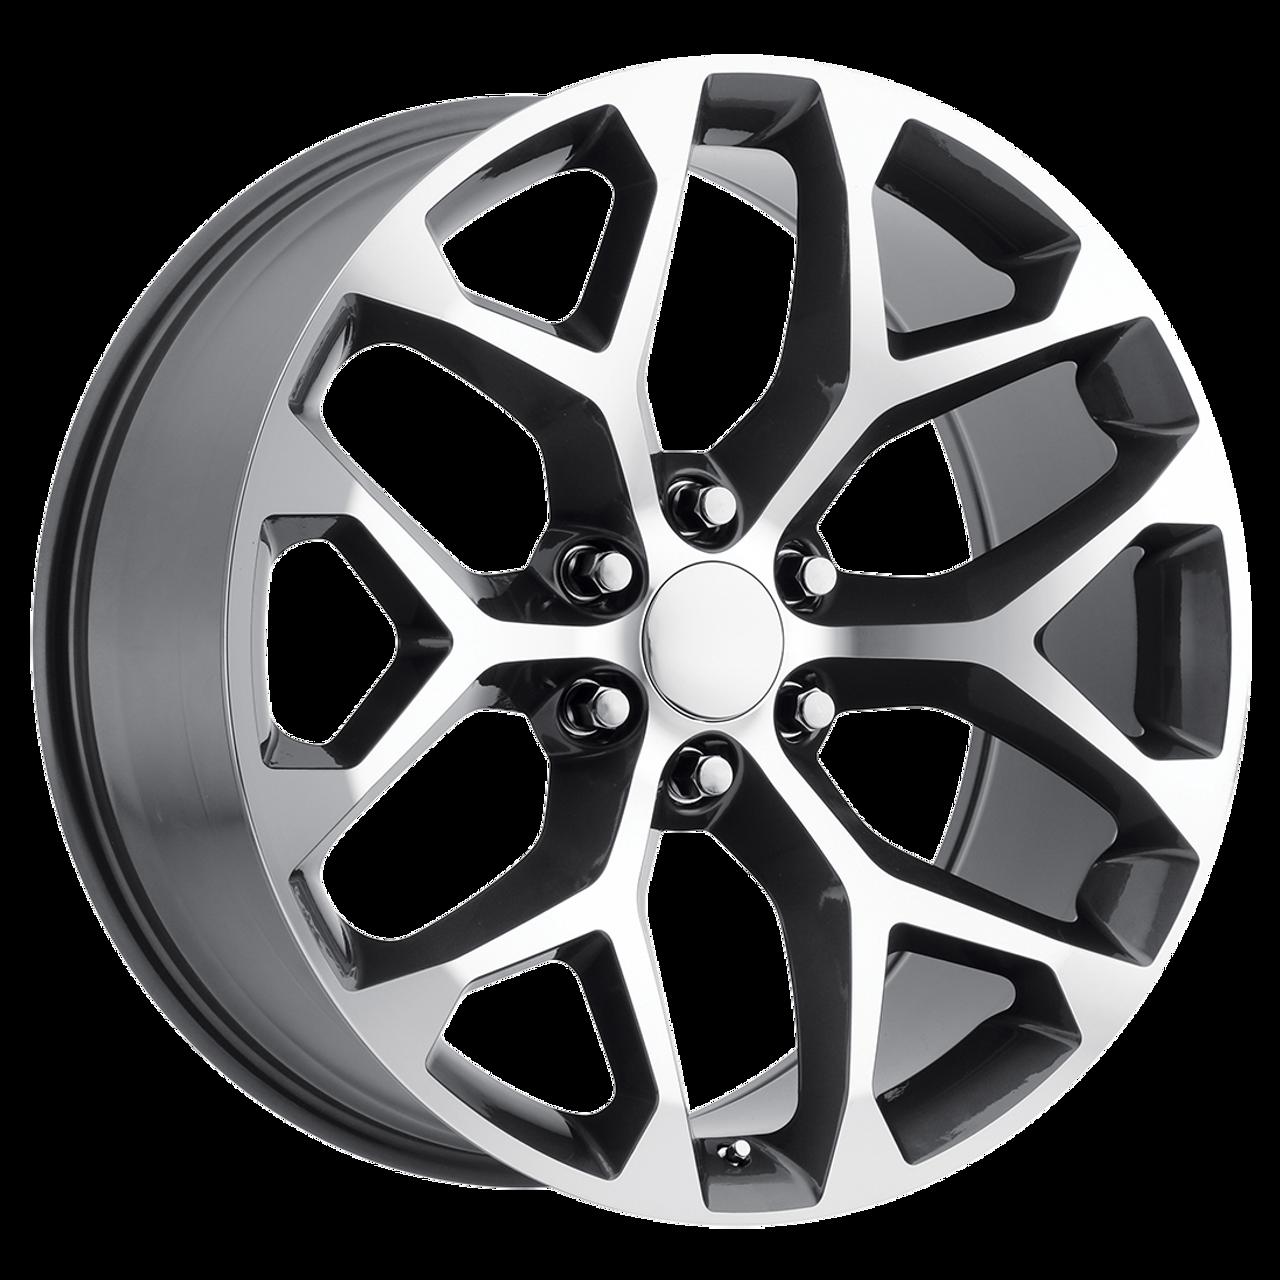 Gmc 22 Inch Gunmetal And Machine Snowflake Rims For Sierra Z71